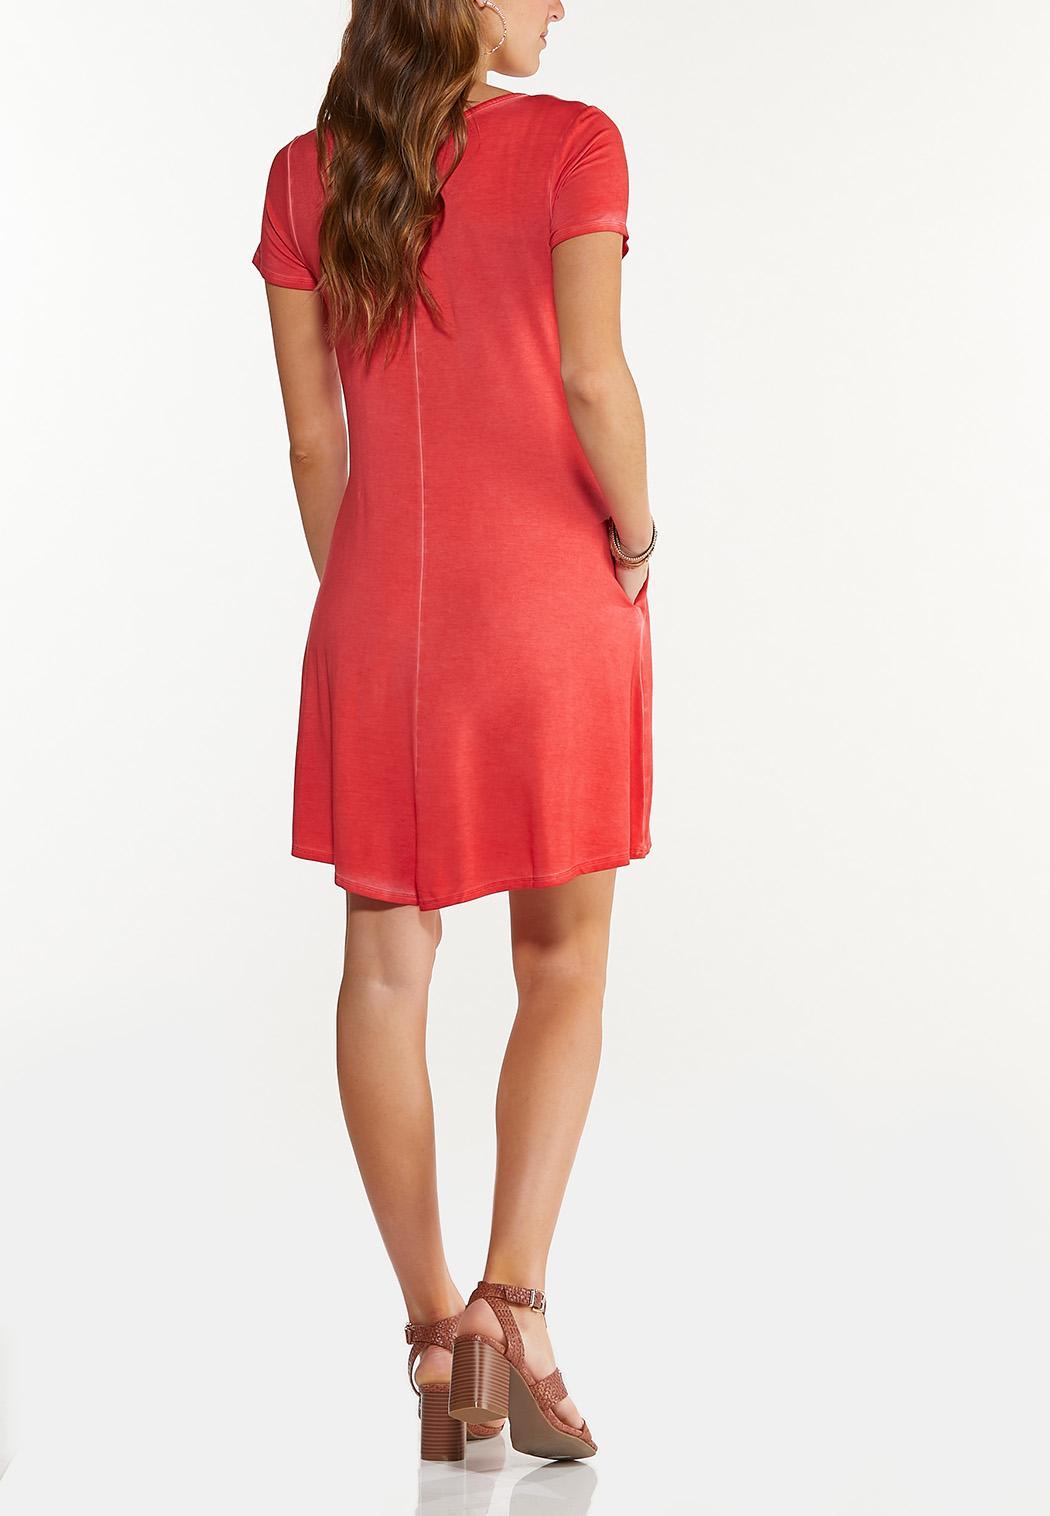 Ruffle Pocket Swing Dress (Item #44547447)